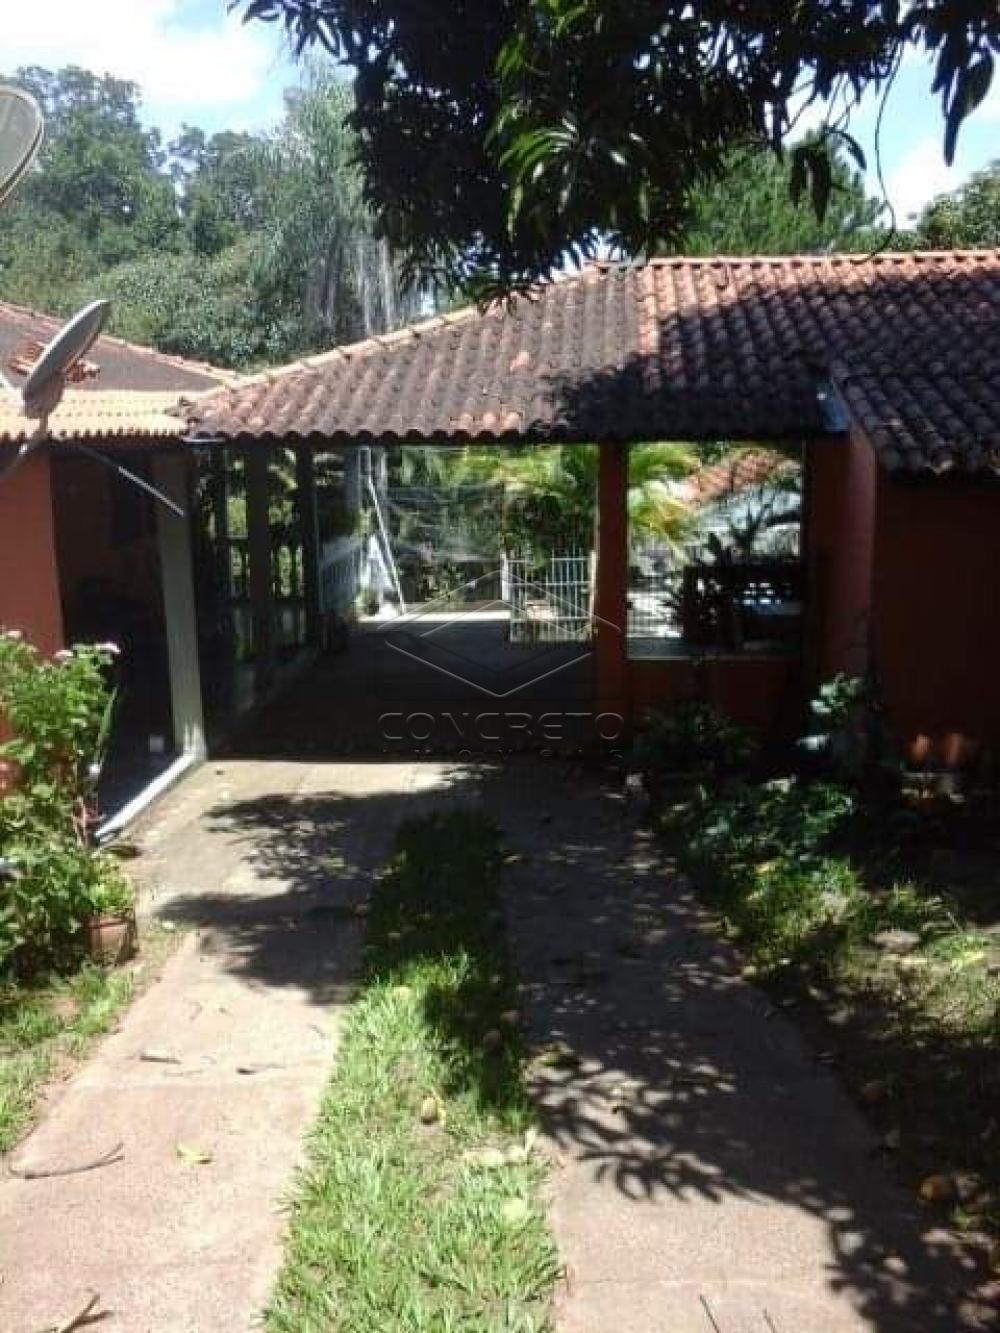 Comprar Rural / Chácara / Fazenda em Avaí R$ 250.000,00 - Foto 1